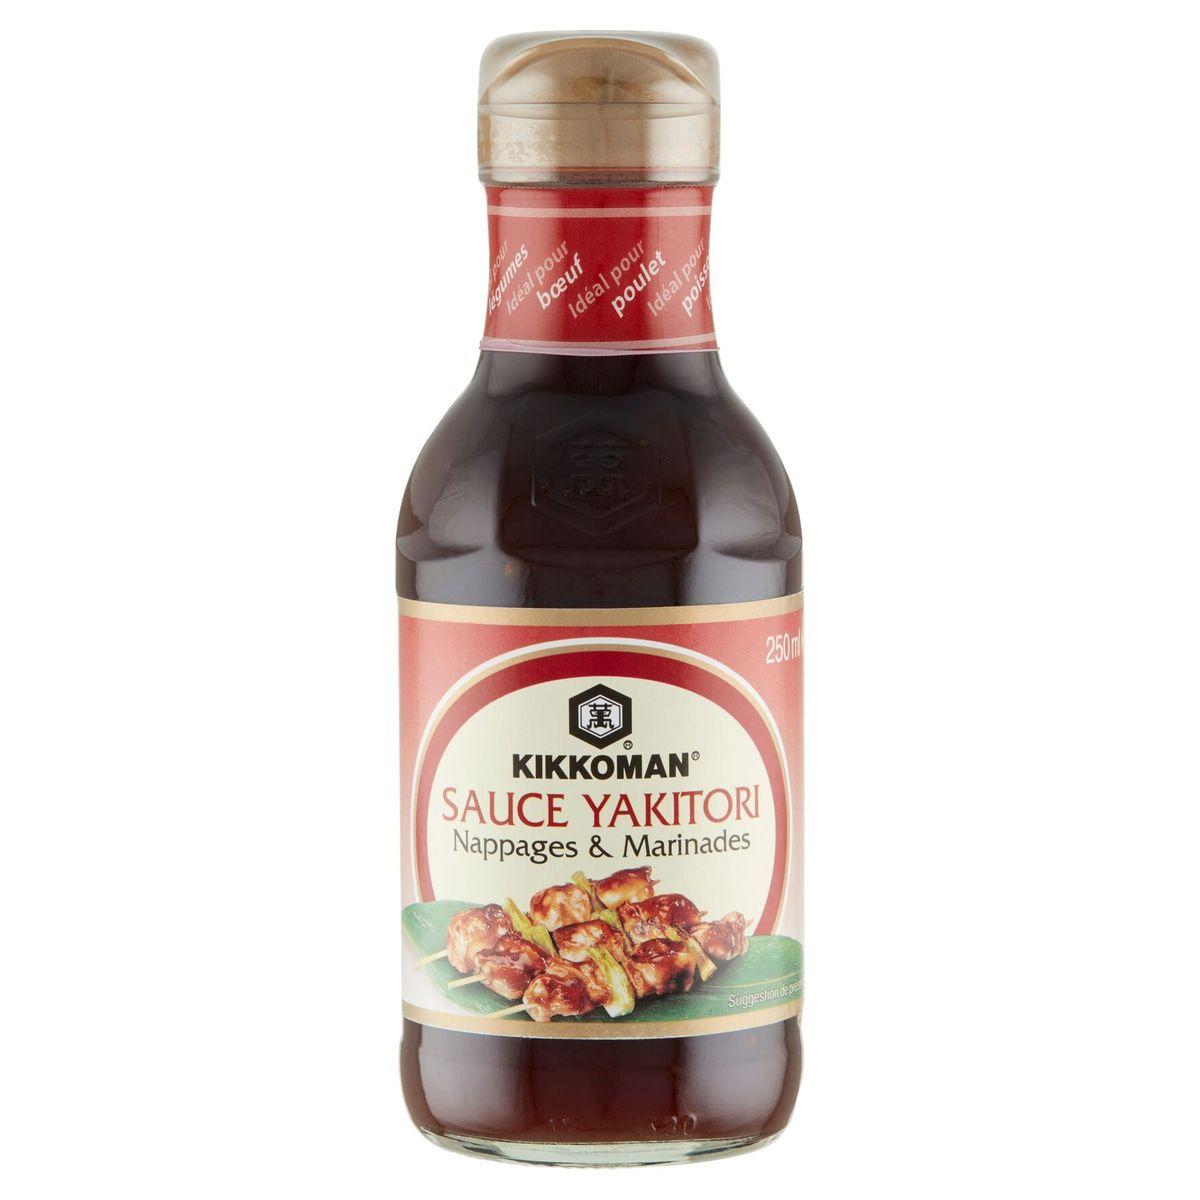 Kikkoman Sauce Yakitori Nappages & Marinades 250 ml